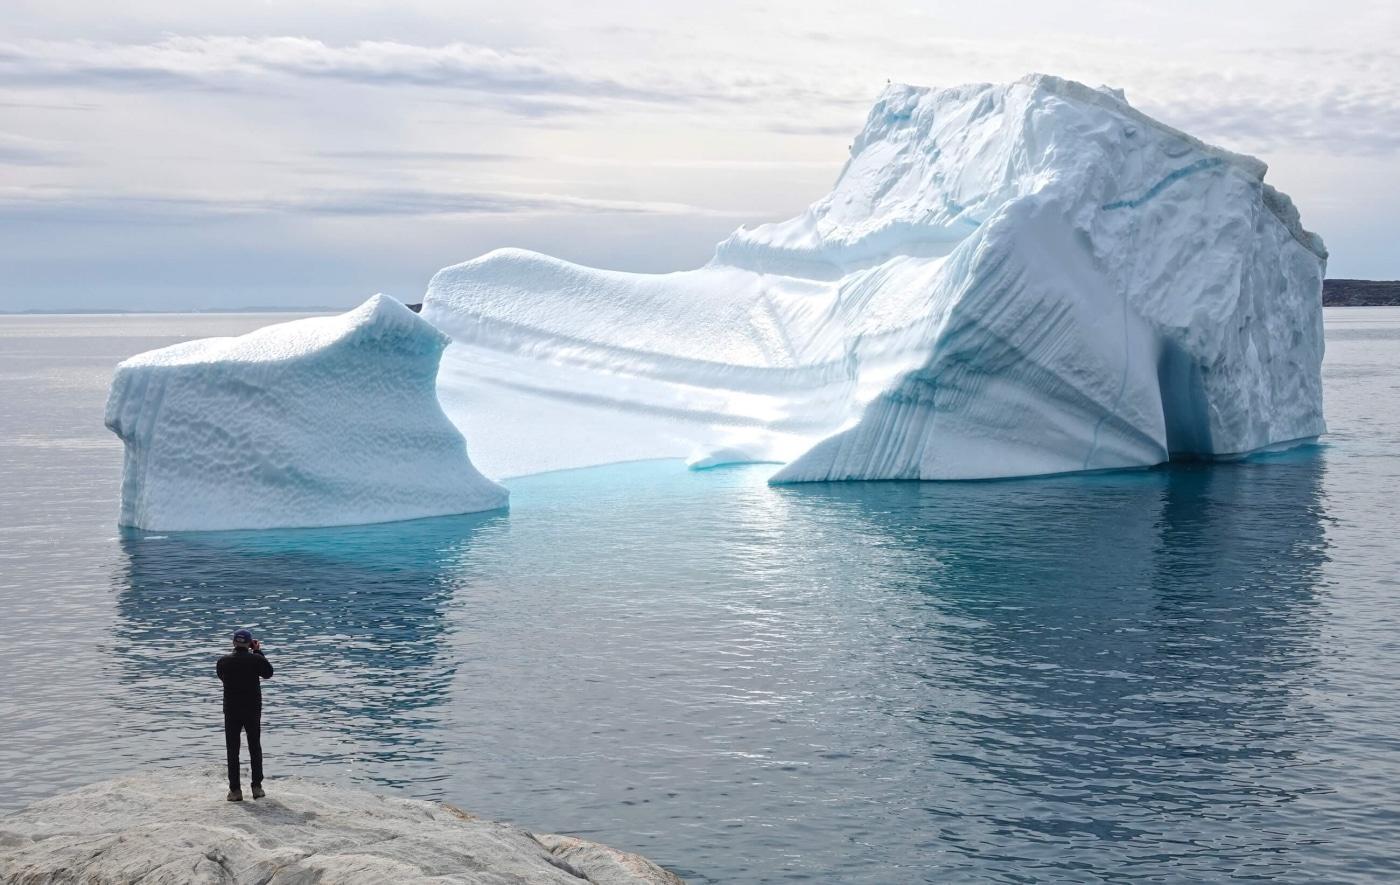 Man looking at a large iceberg near Disko Bay. Photo by Espen Andersen, Visit Greenland